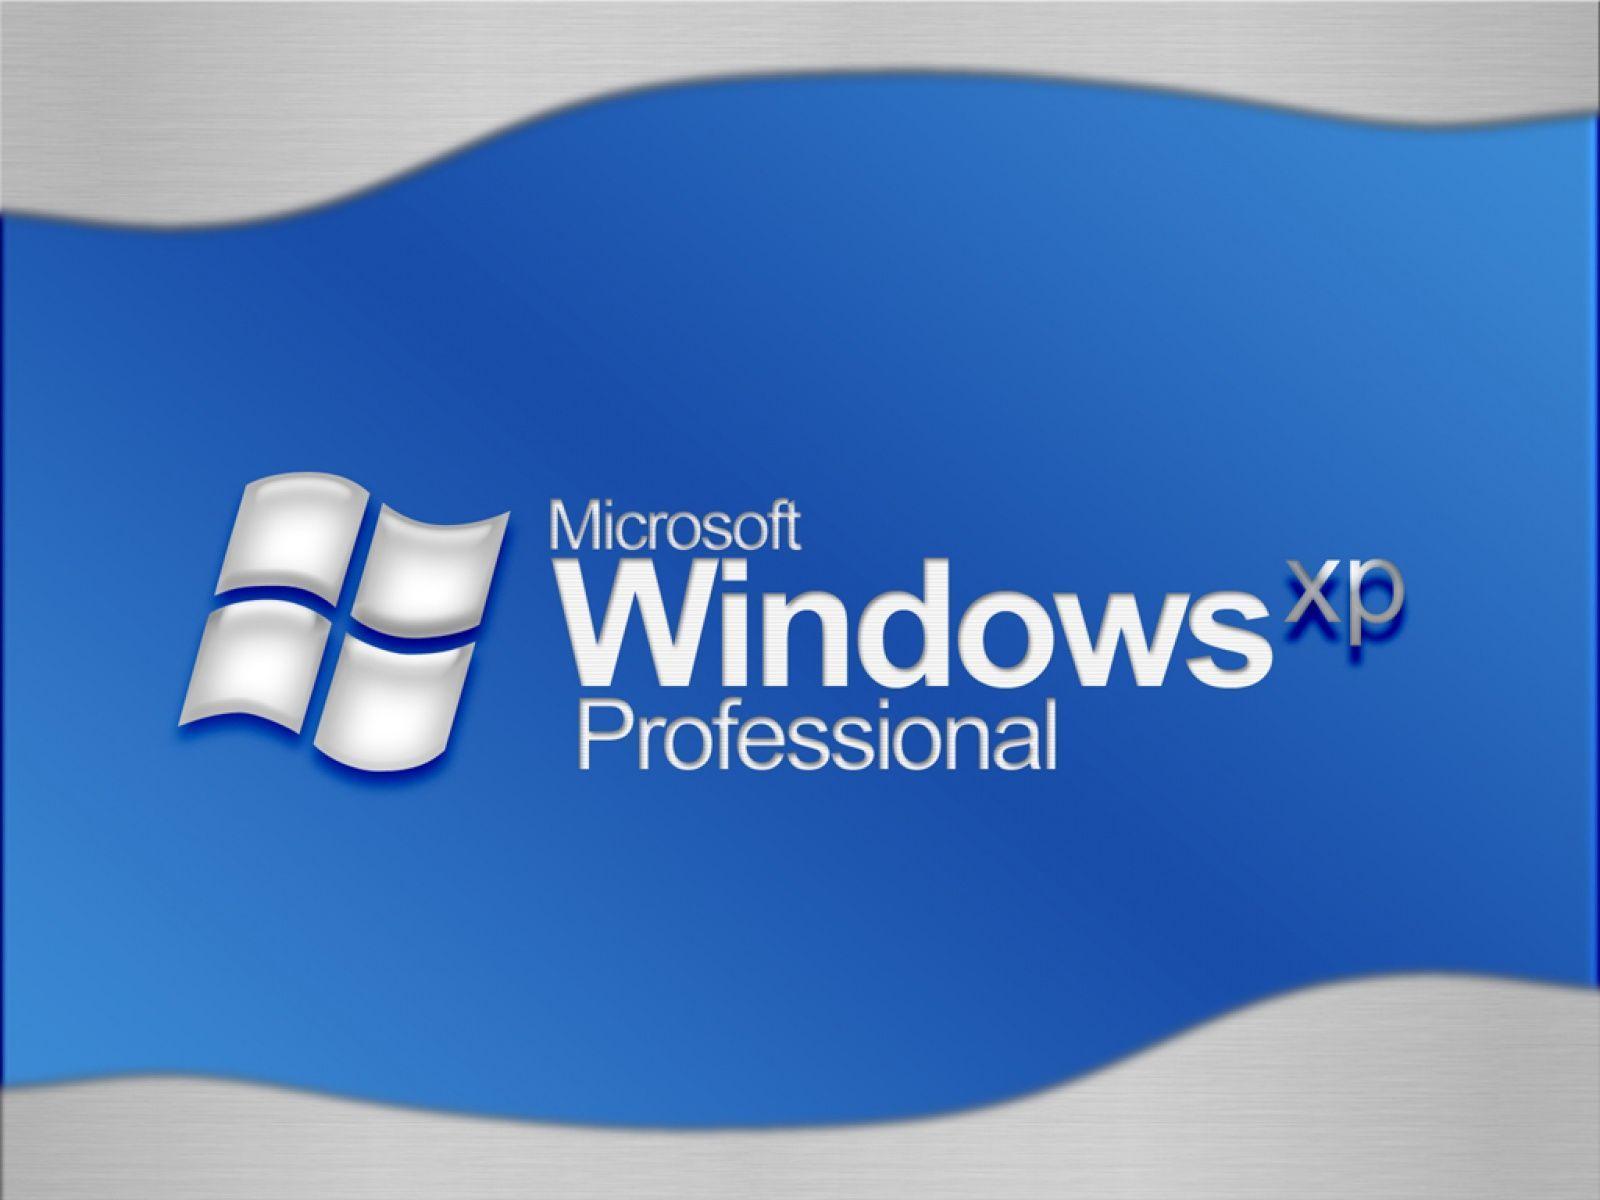 windows xp pro wallpapers wallpaper cave